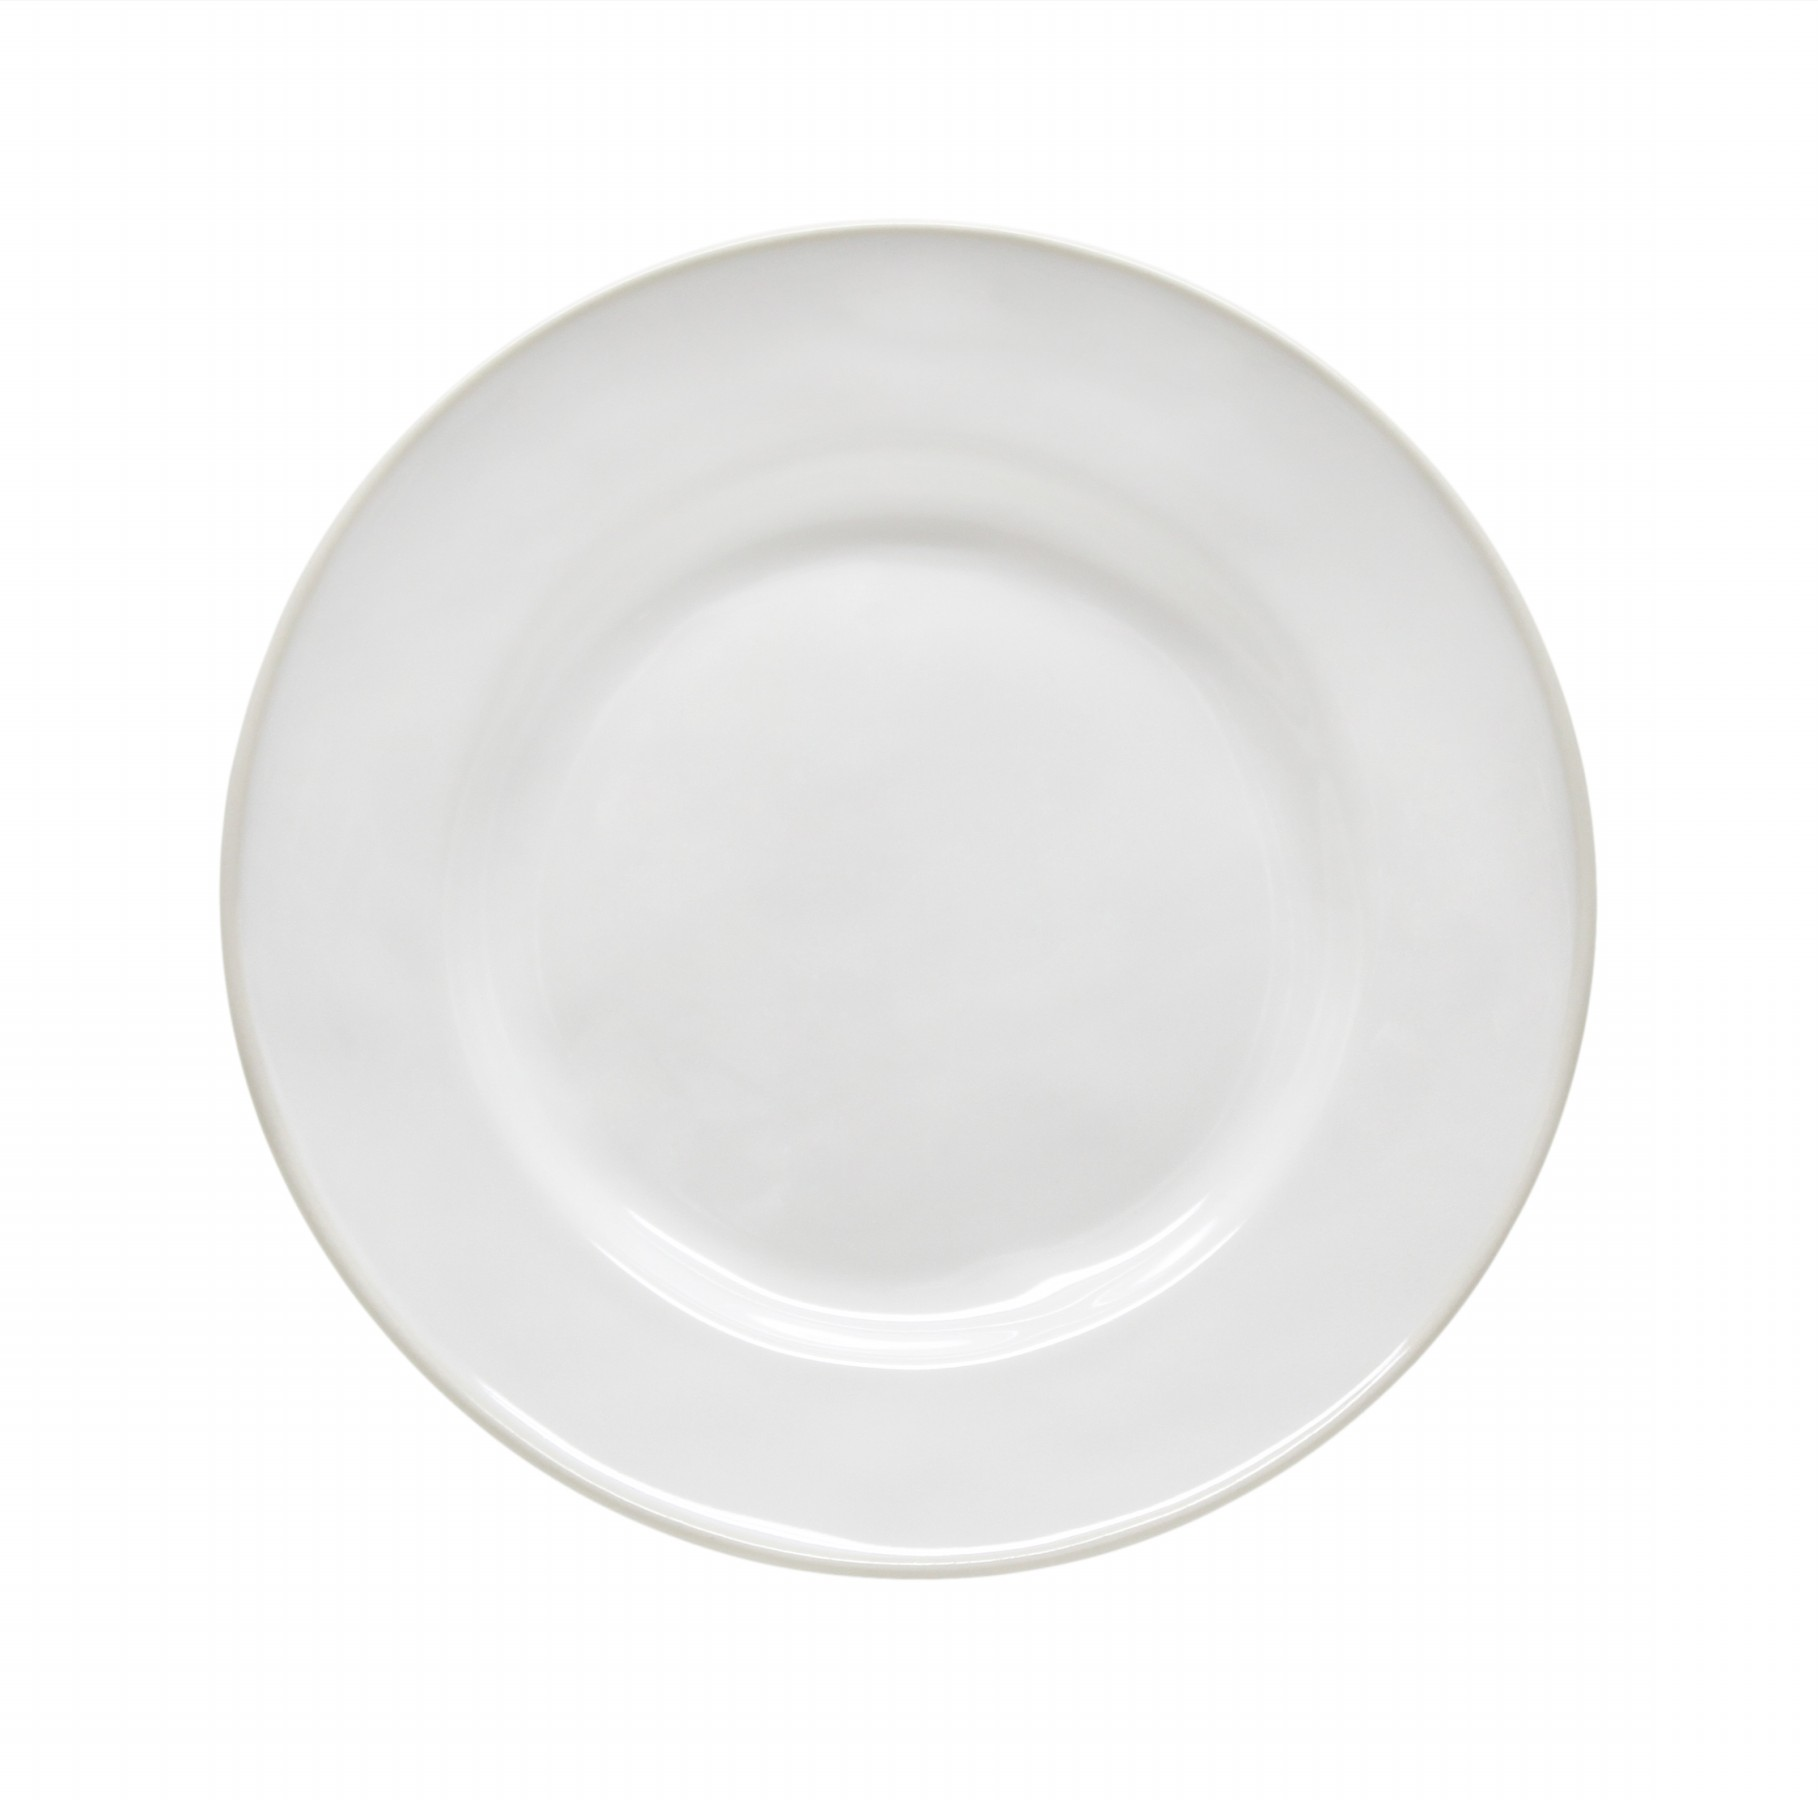 COSTA NOVA Dezertní talíř Astoria bílý 23cm